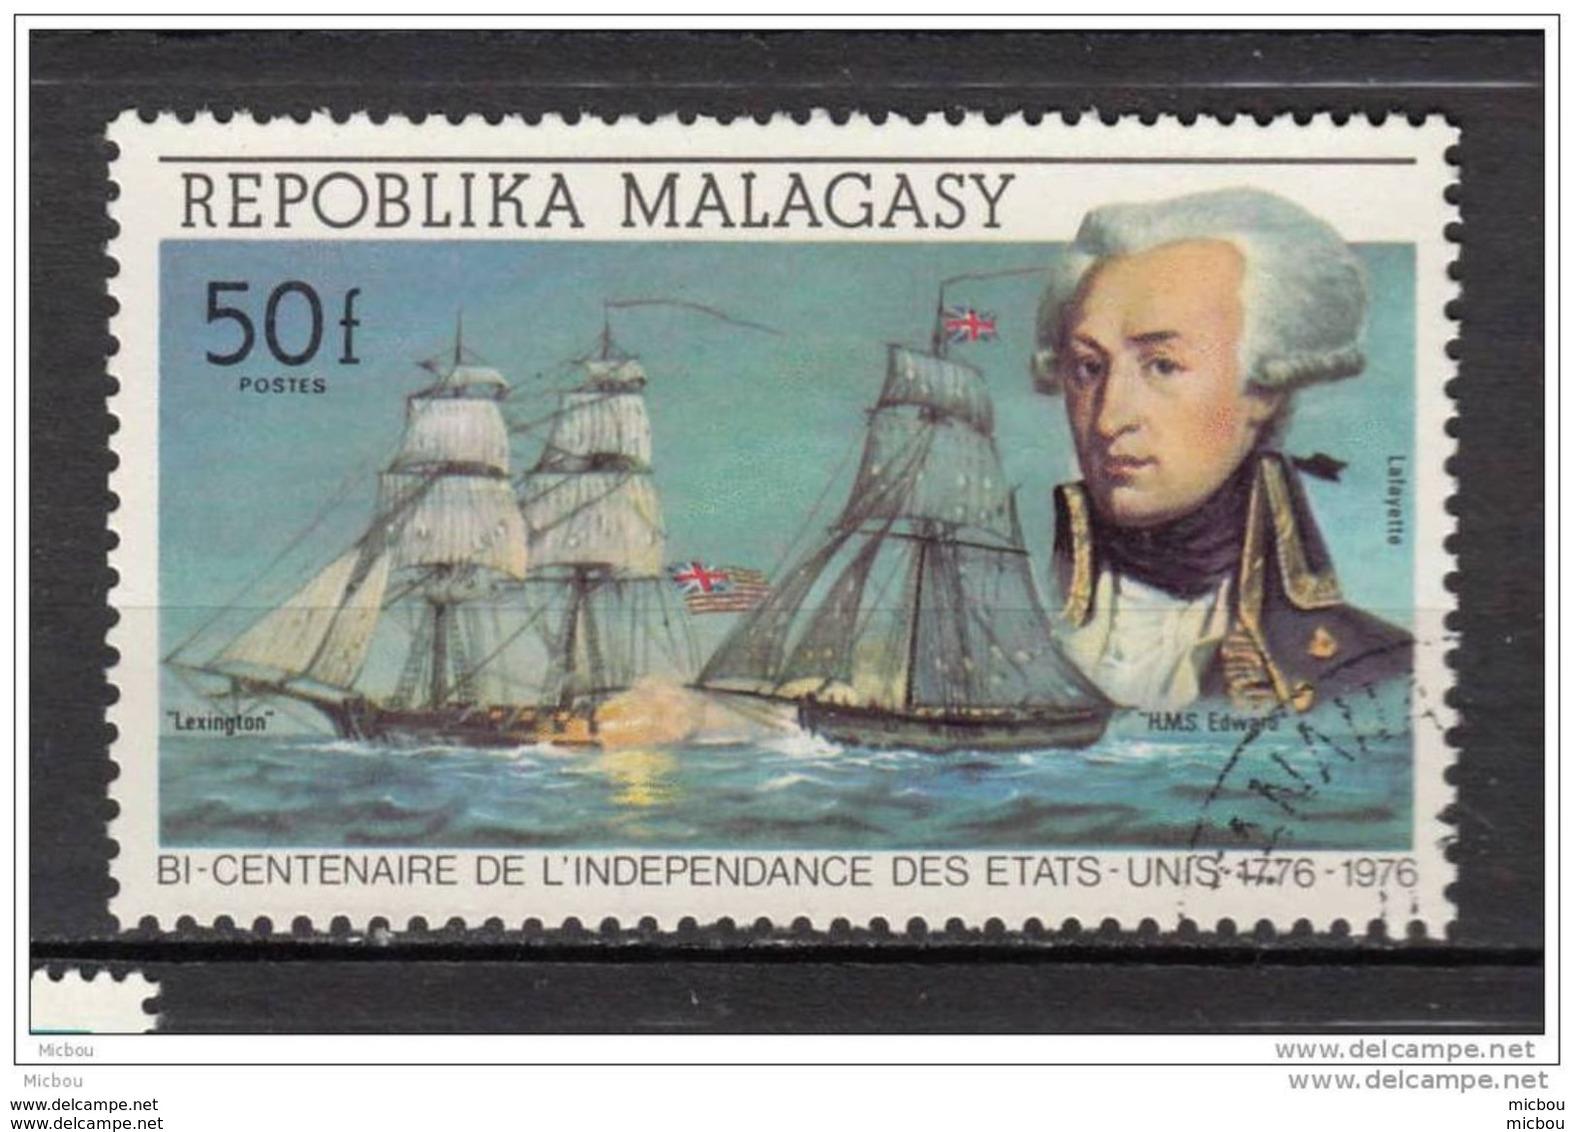 Madagascar, Malagasy, Indépendance Des USA, Perruque, Lafayette, Histoire, History, Bateau, Boat, Perruque, Wig - Onafhankelijkheid USA